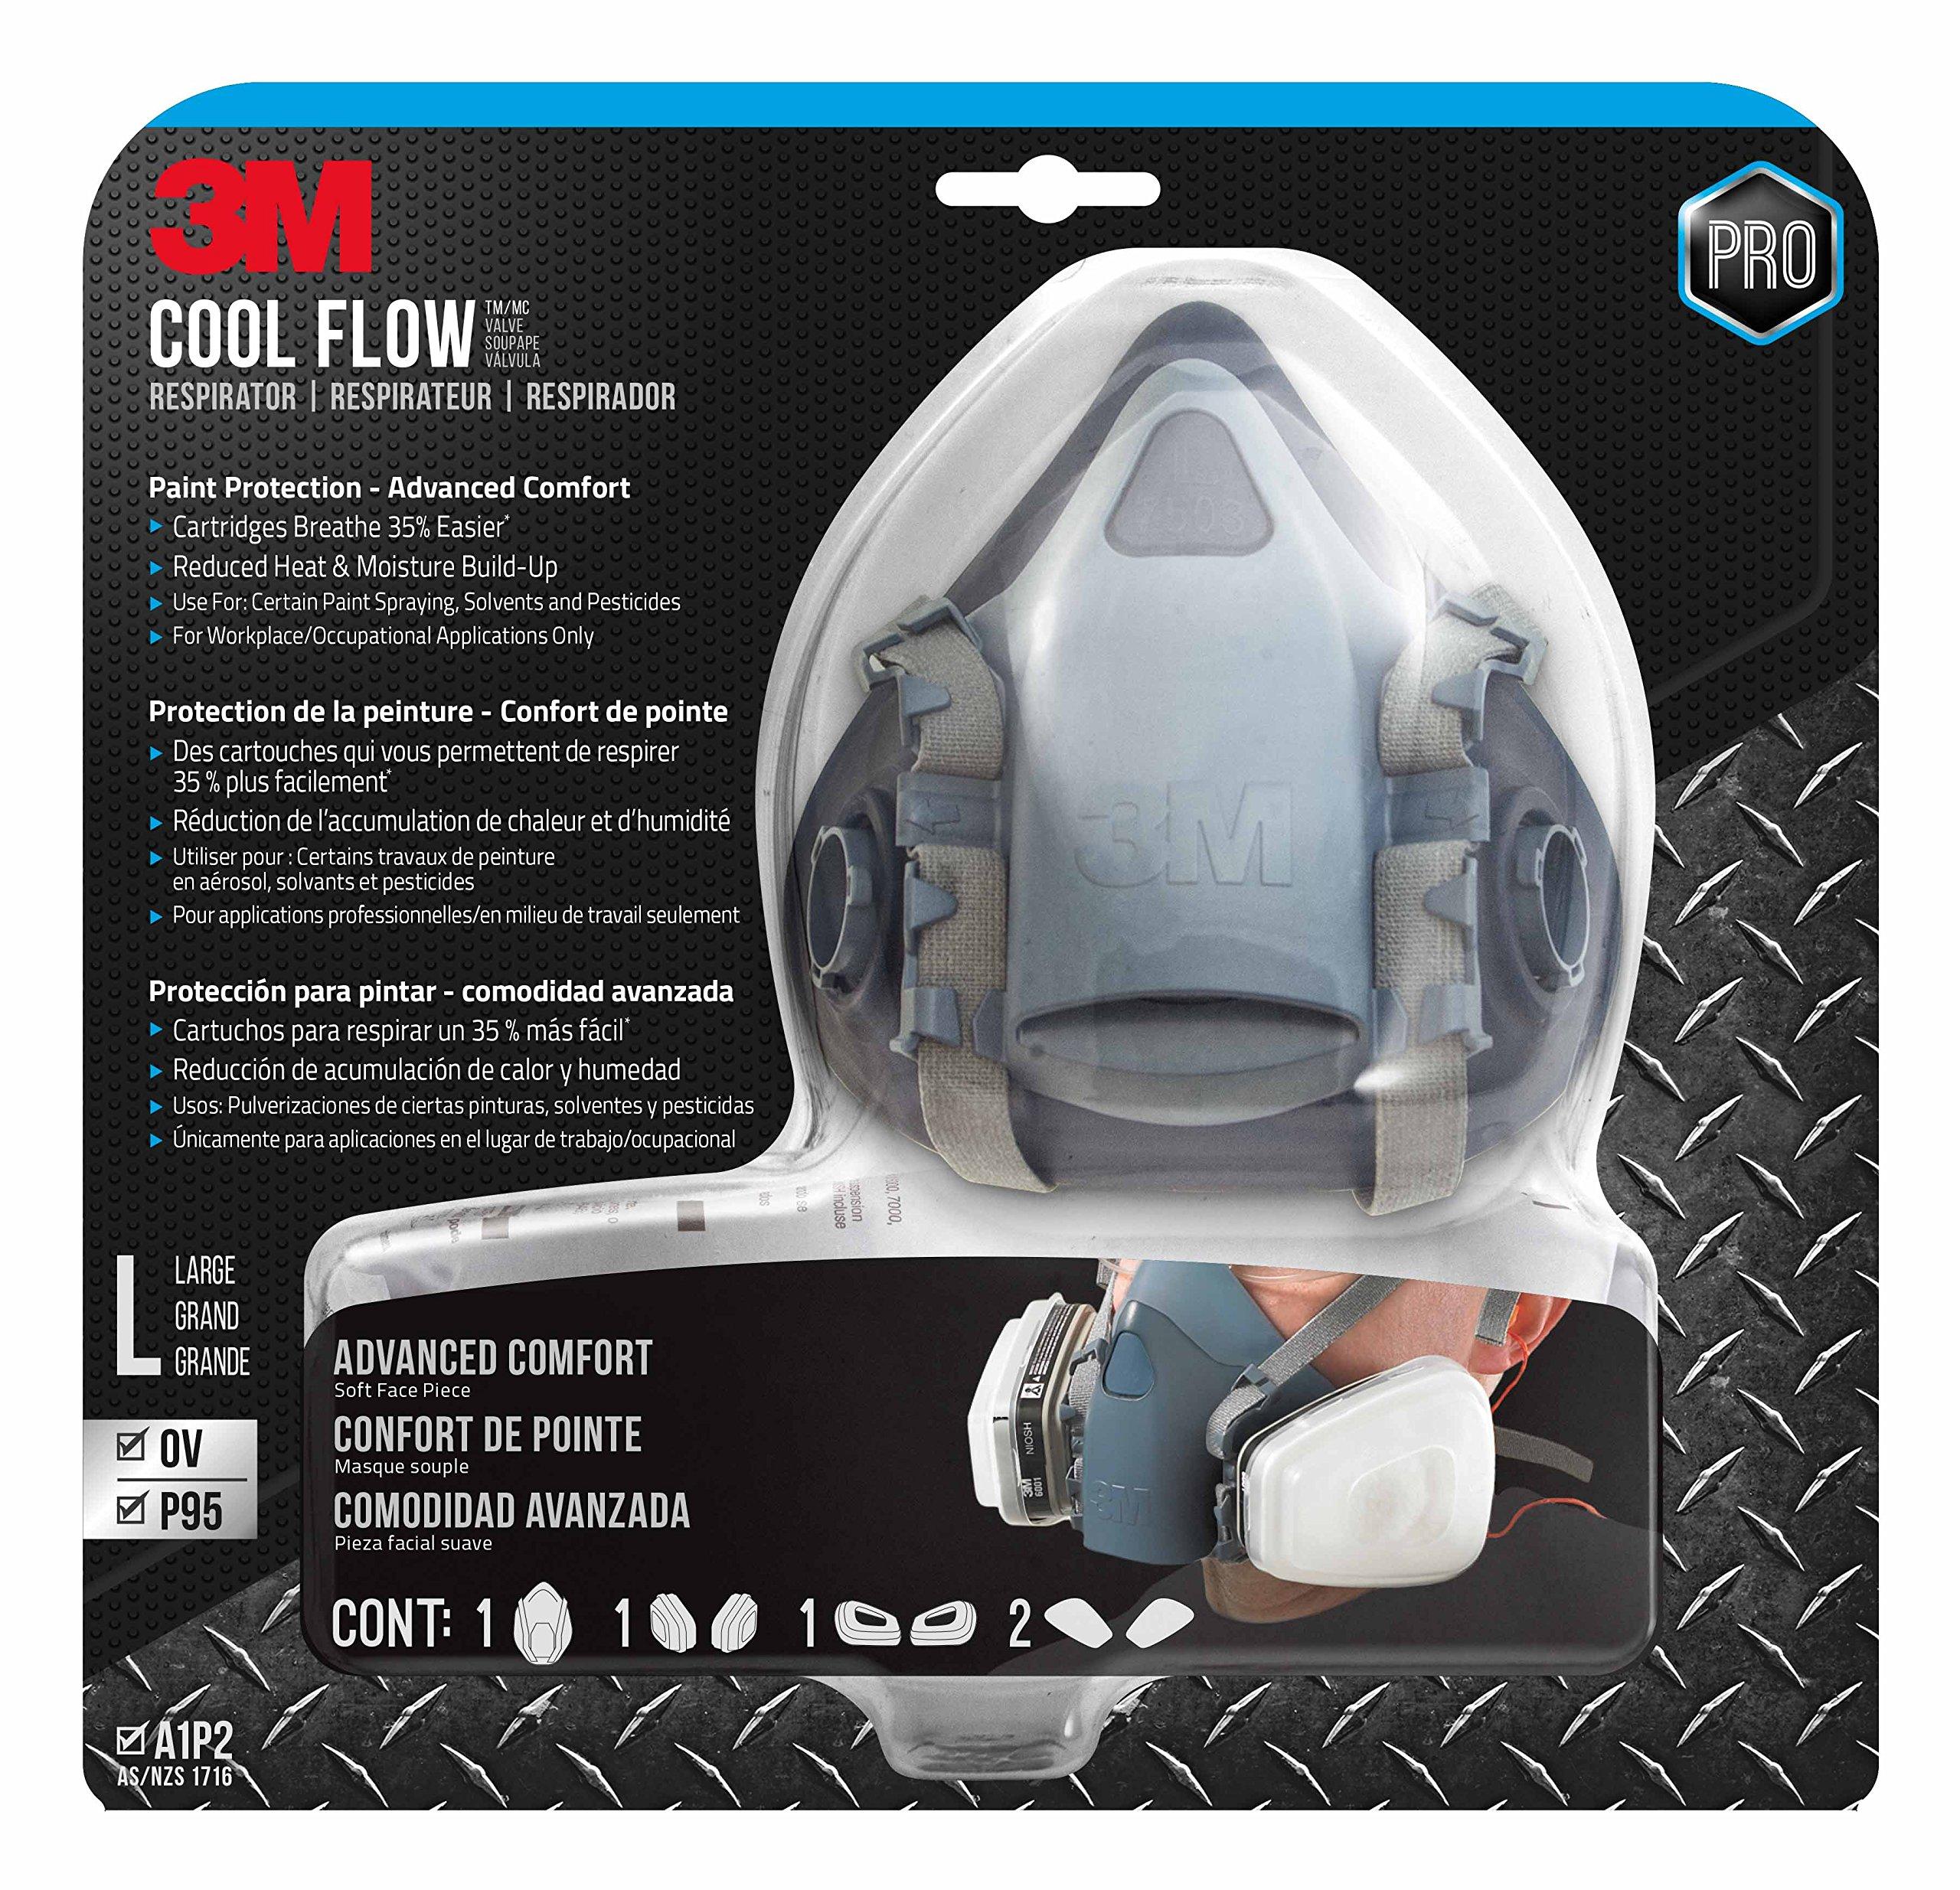 3M 7513PA1-A-PS Professional Half Mask Organic Vapor, P95 Respirator, Large by 3M Safety